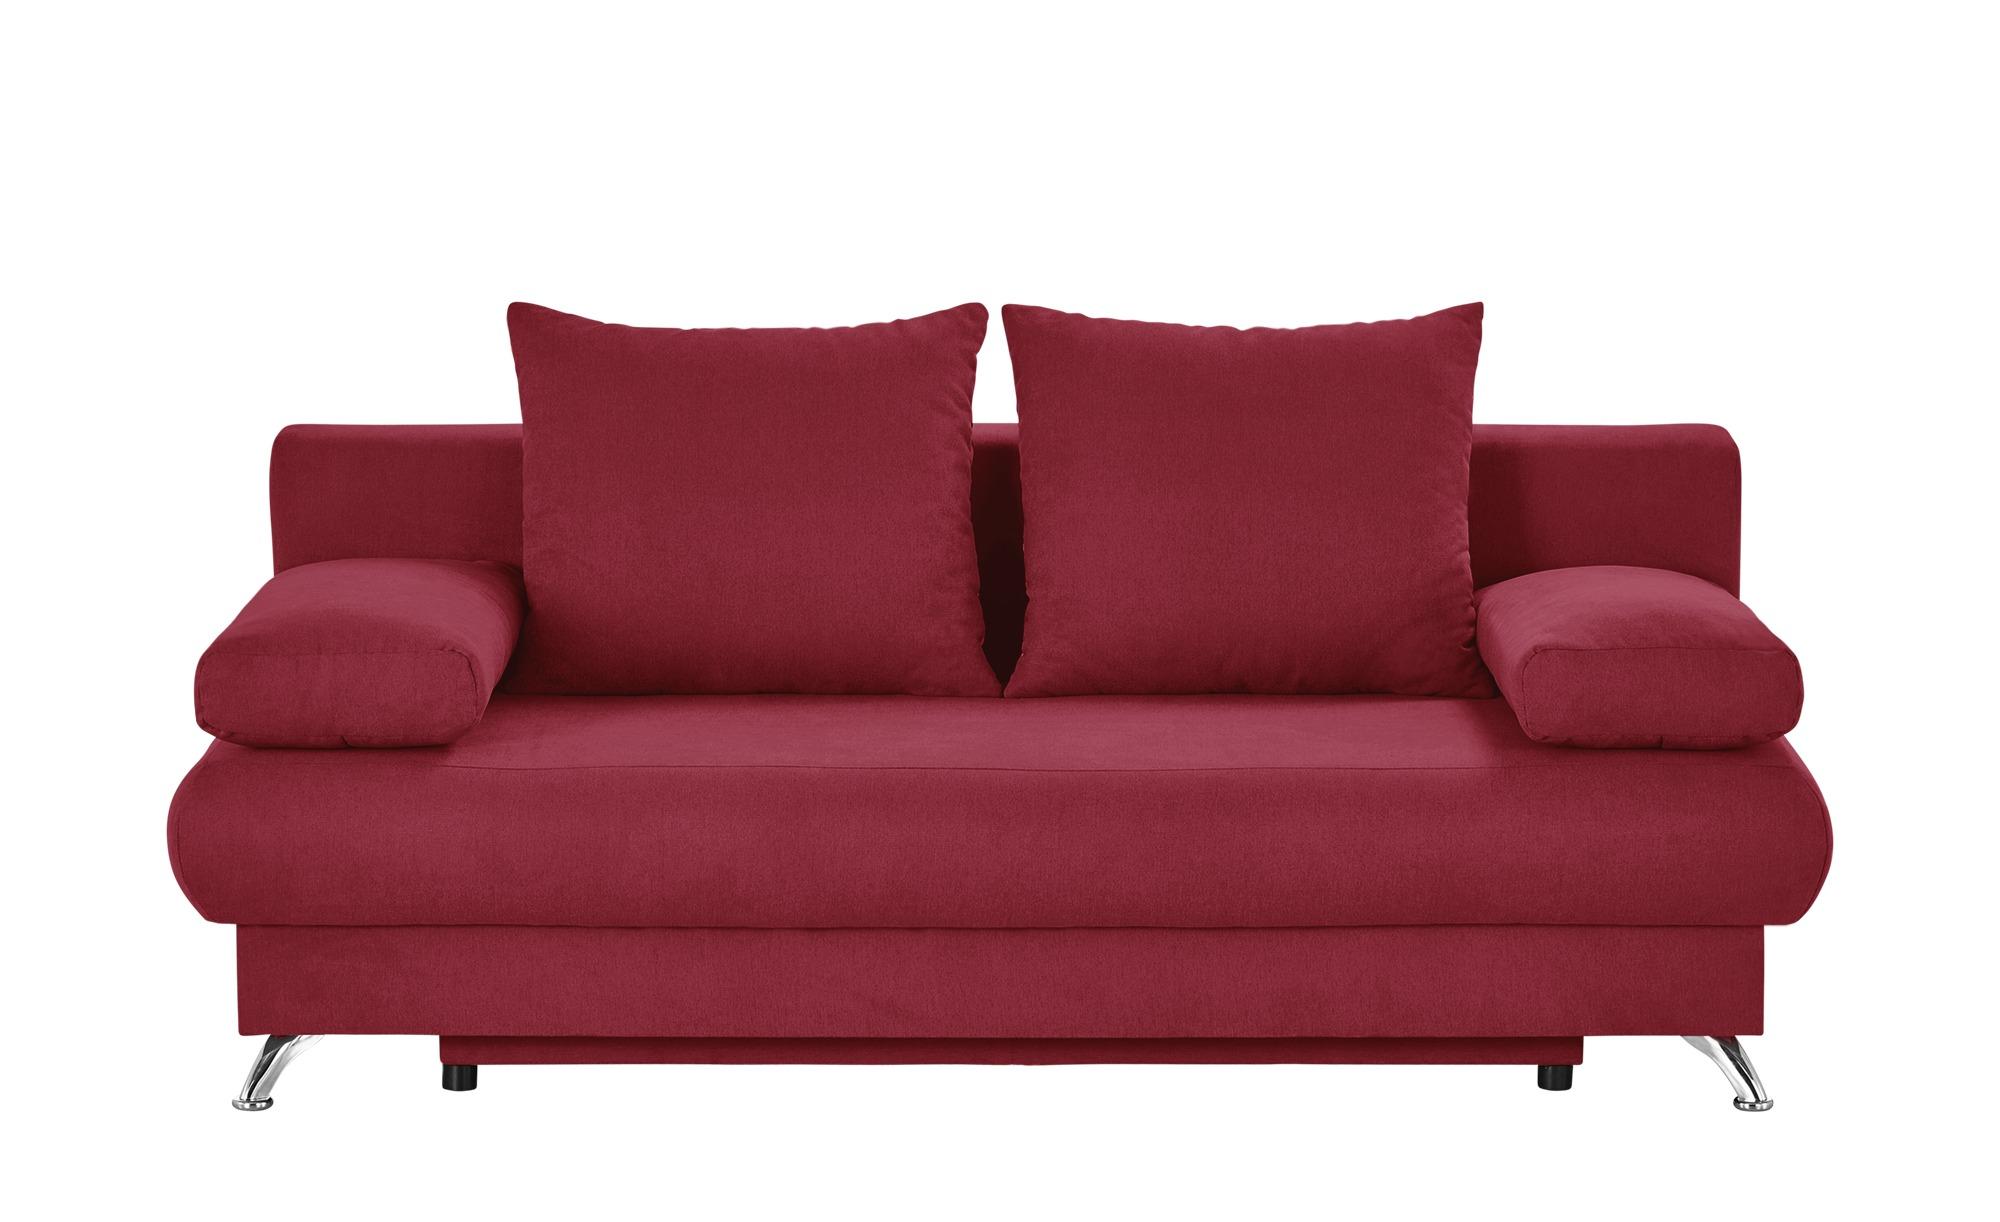 Schlafsofa rot - Flachgewebe Viola ¦ rot ¦ Maße (cm): B: 203 H: 72 T: 93 Polstermöbel > Sofas > 2-Sitzer - Höffner